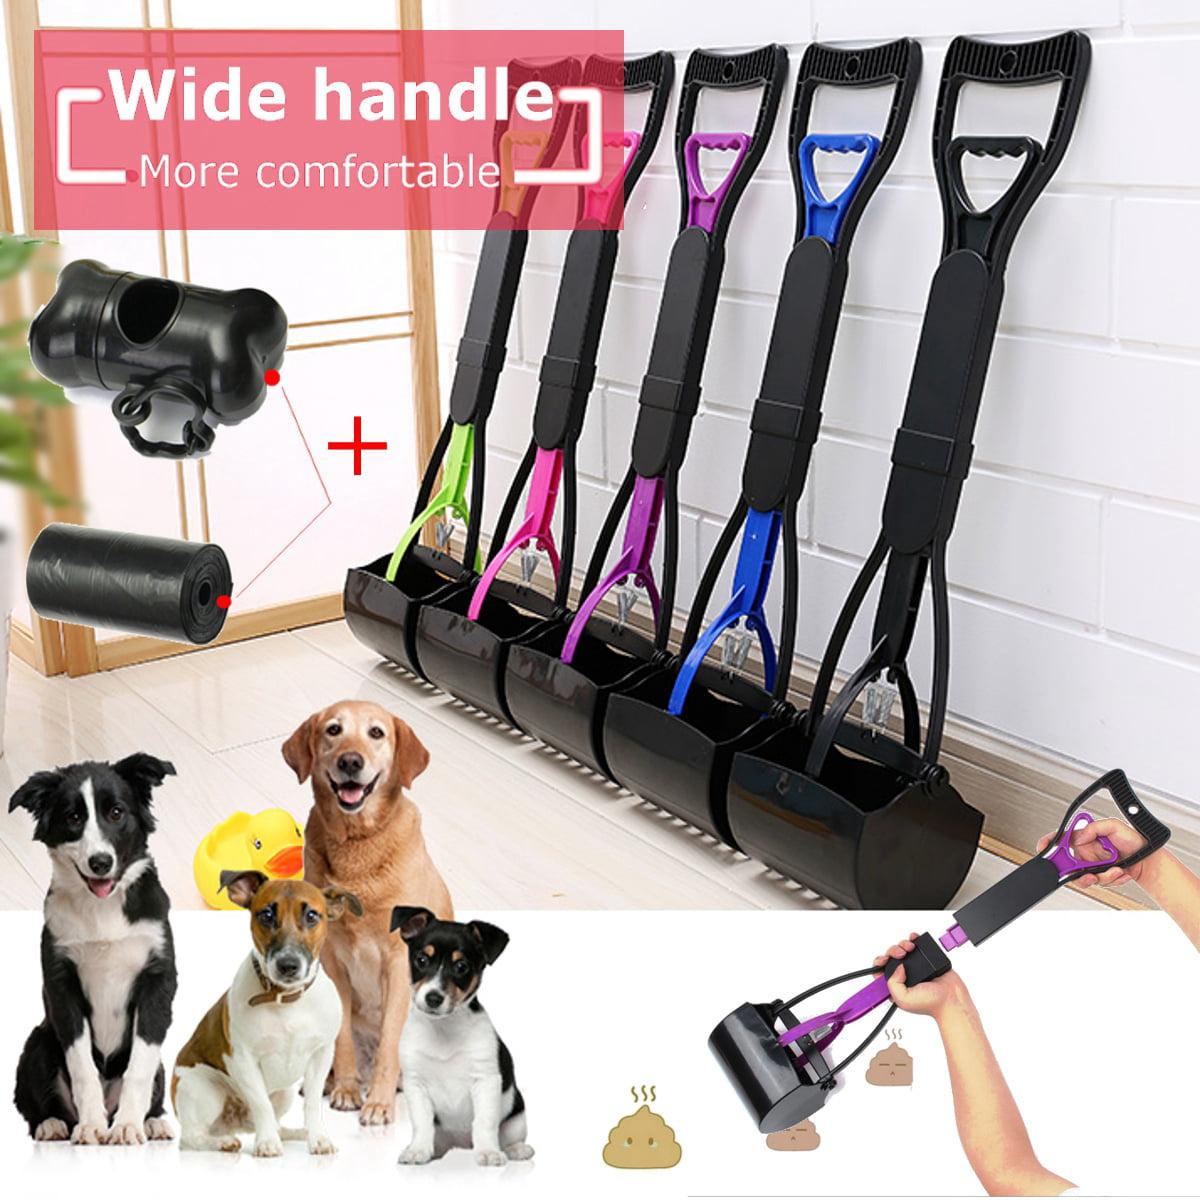 Pet Cat Dog Pooper Scooper Plastic Jaw Pets Poop Scoop Pick Up Easy Clean Waste Shovel Long Handle + Plastic Bag